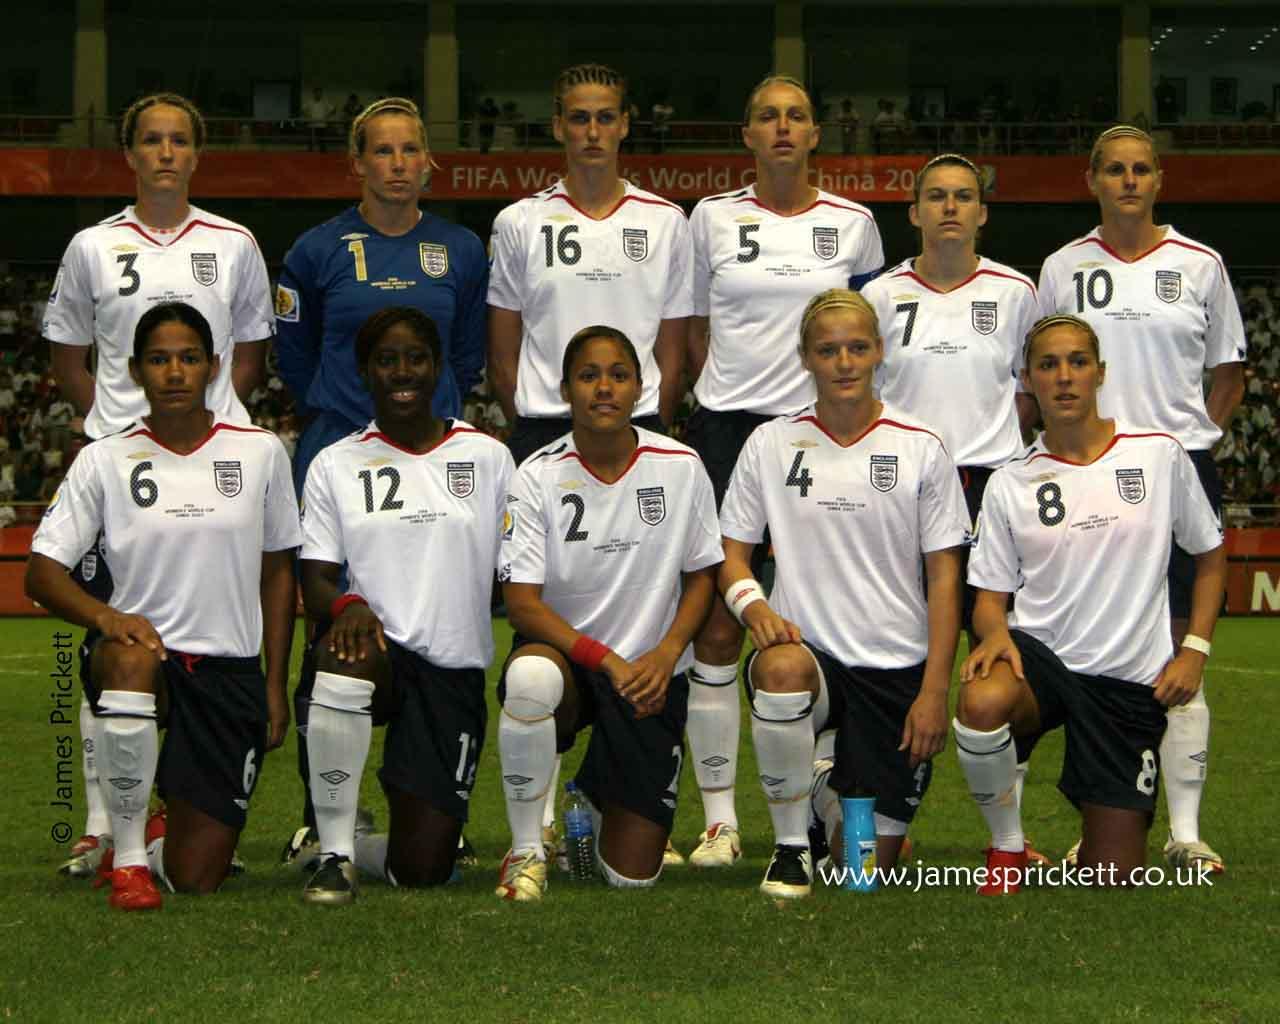 England Football Team Wallpaper   Soccer Walls 1280x1024